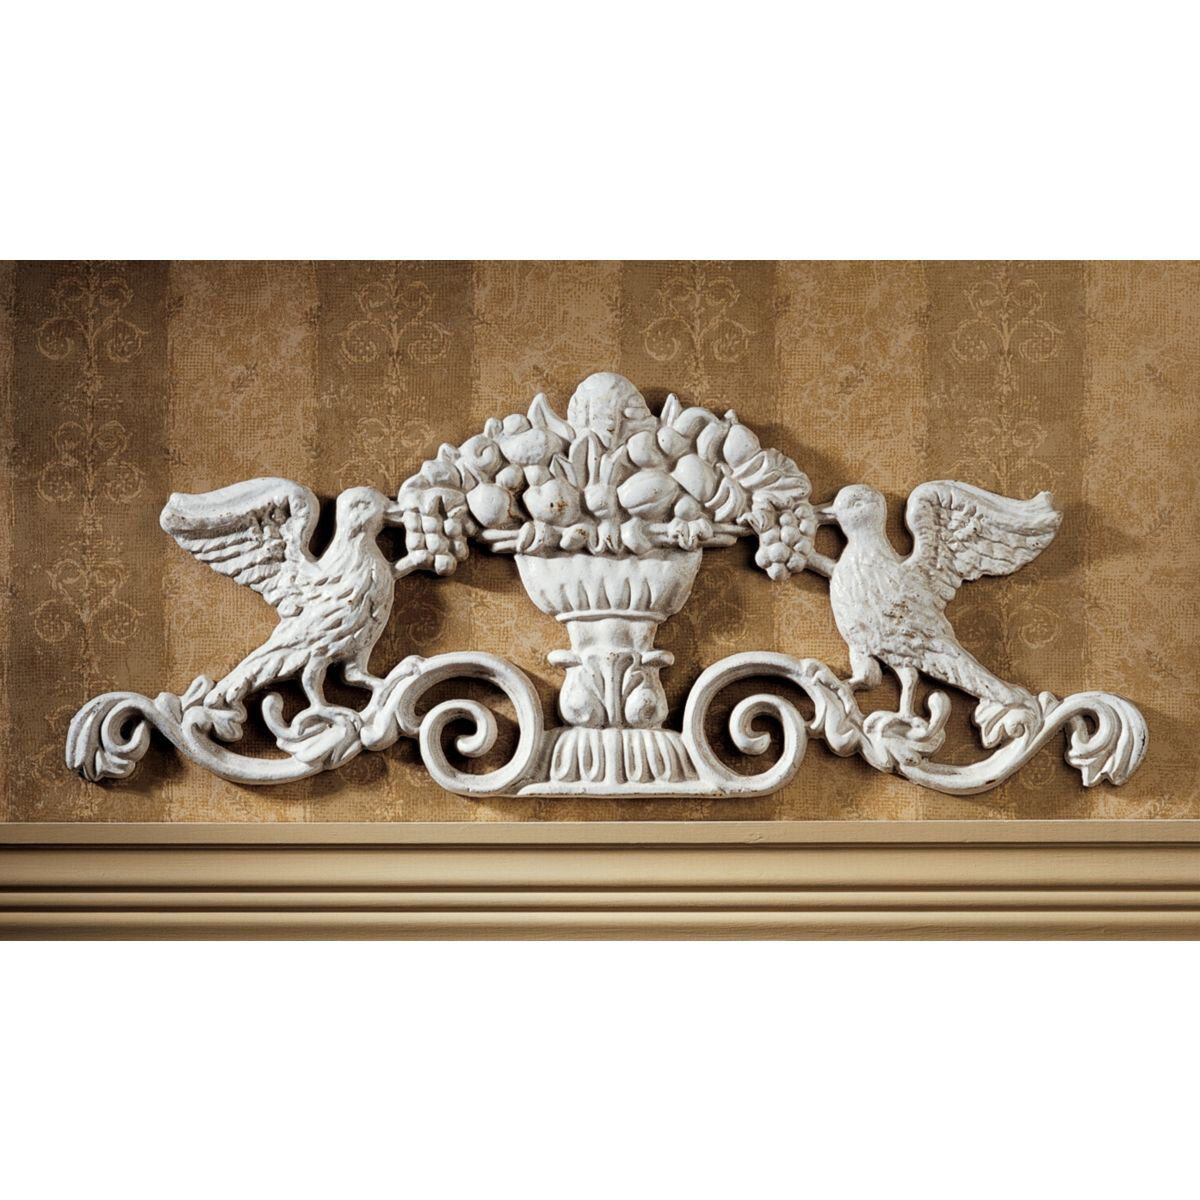 Design Toscano Baroque Architectural Pediment Wall Décor